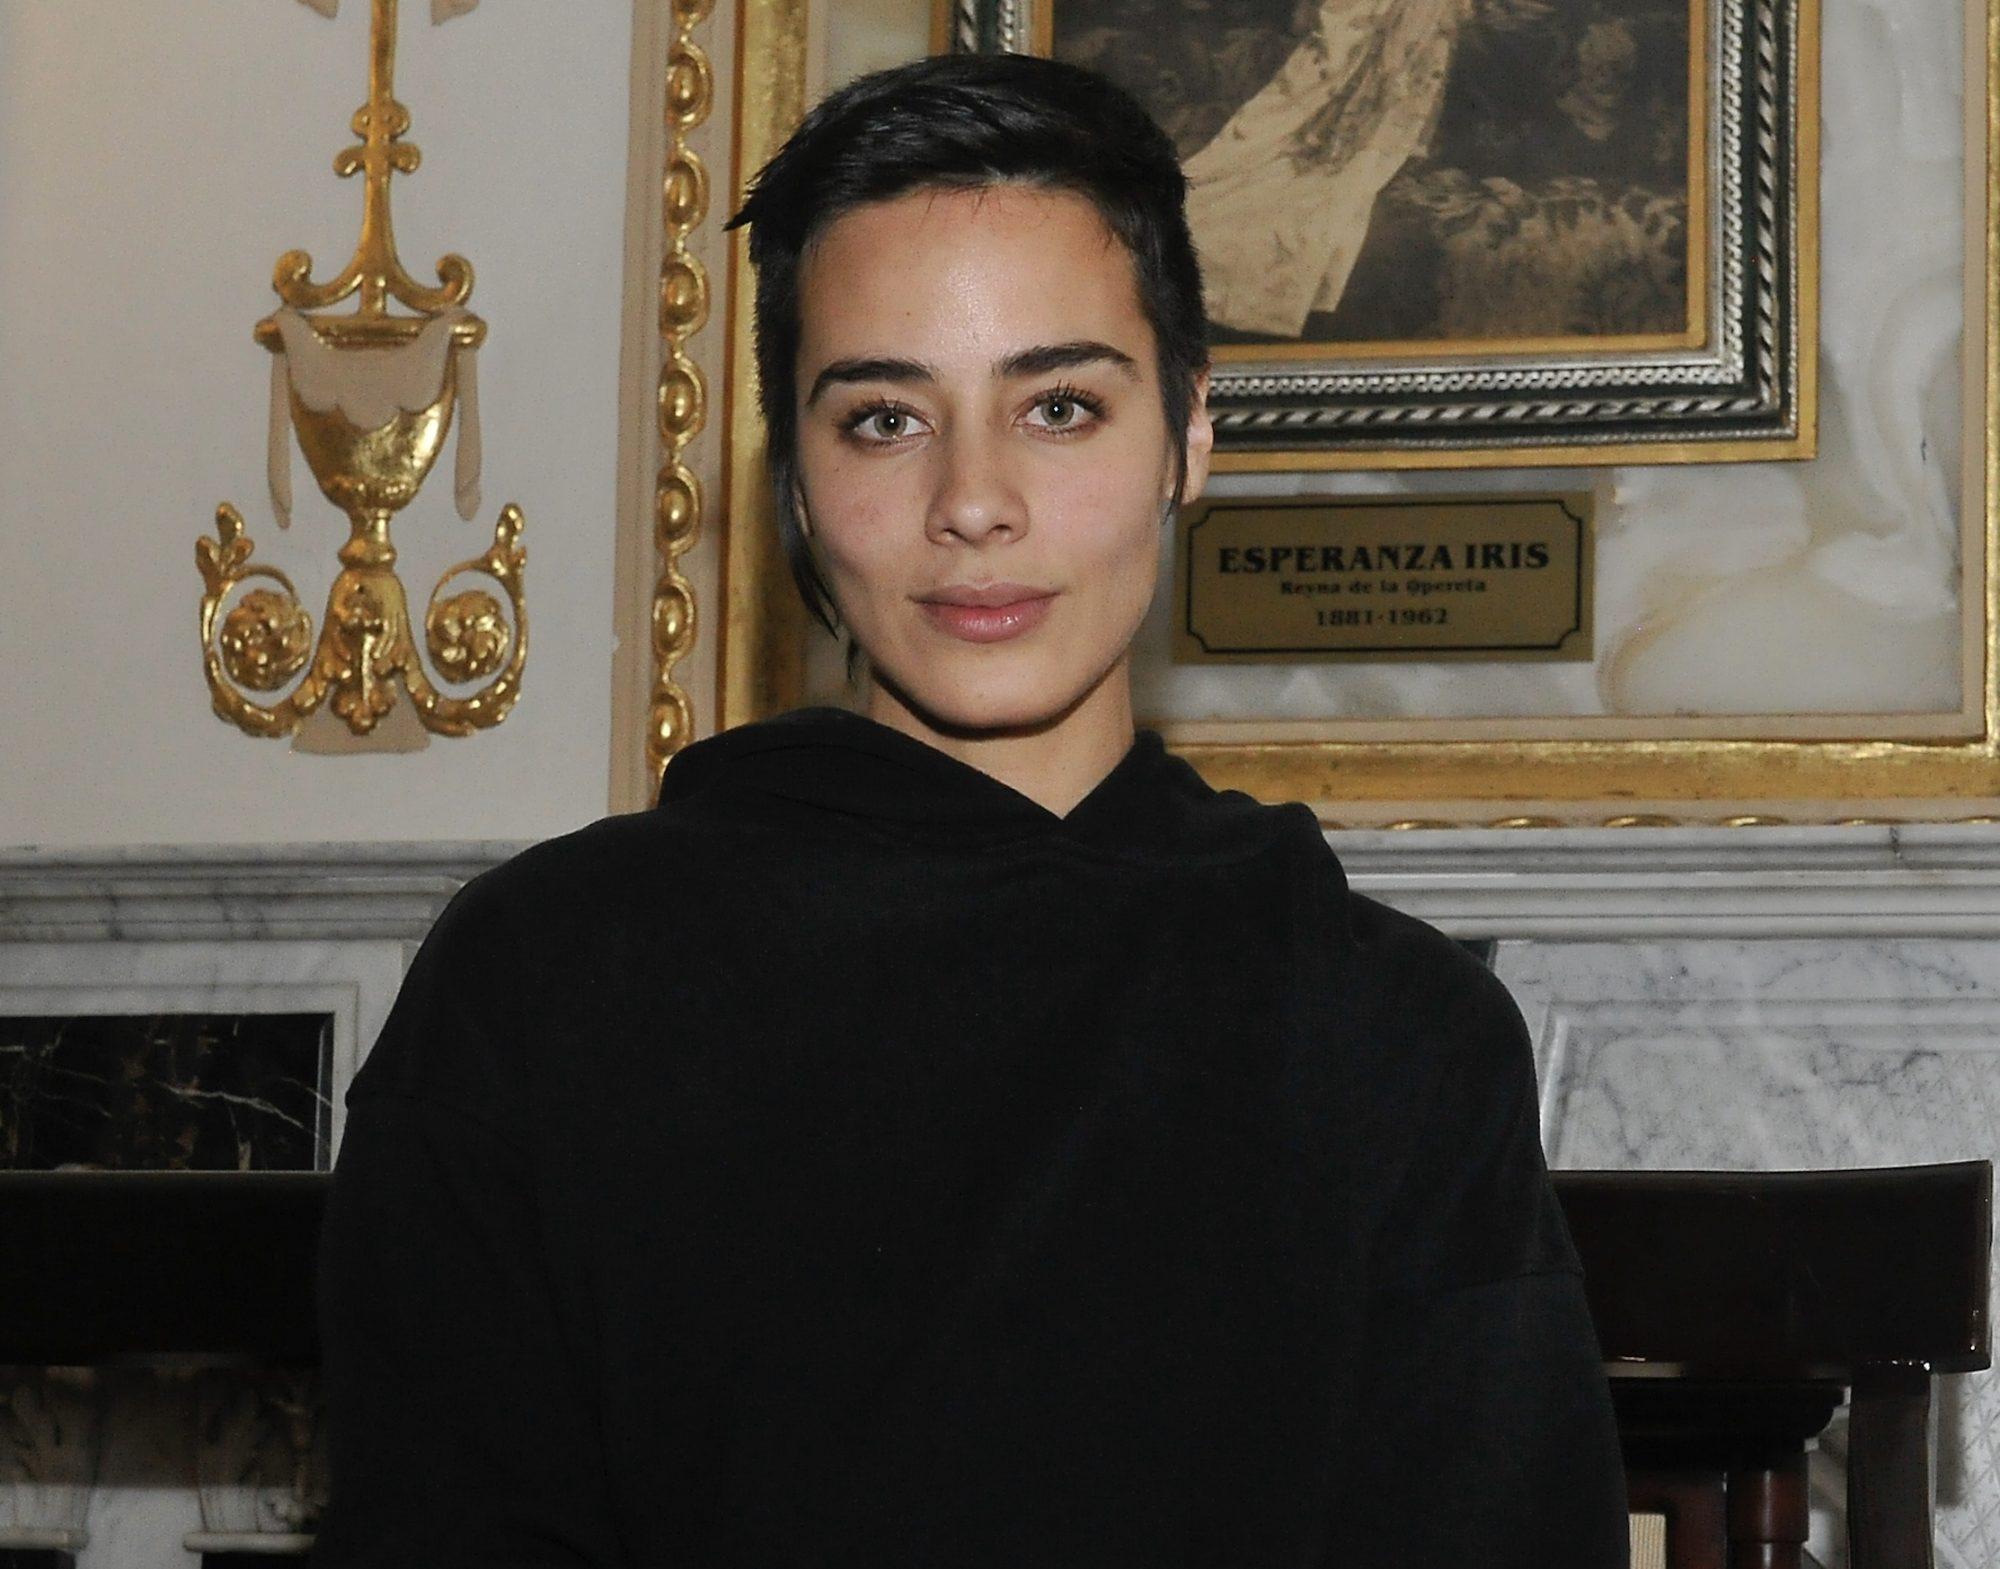 Esmeralda Pimentel